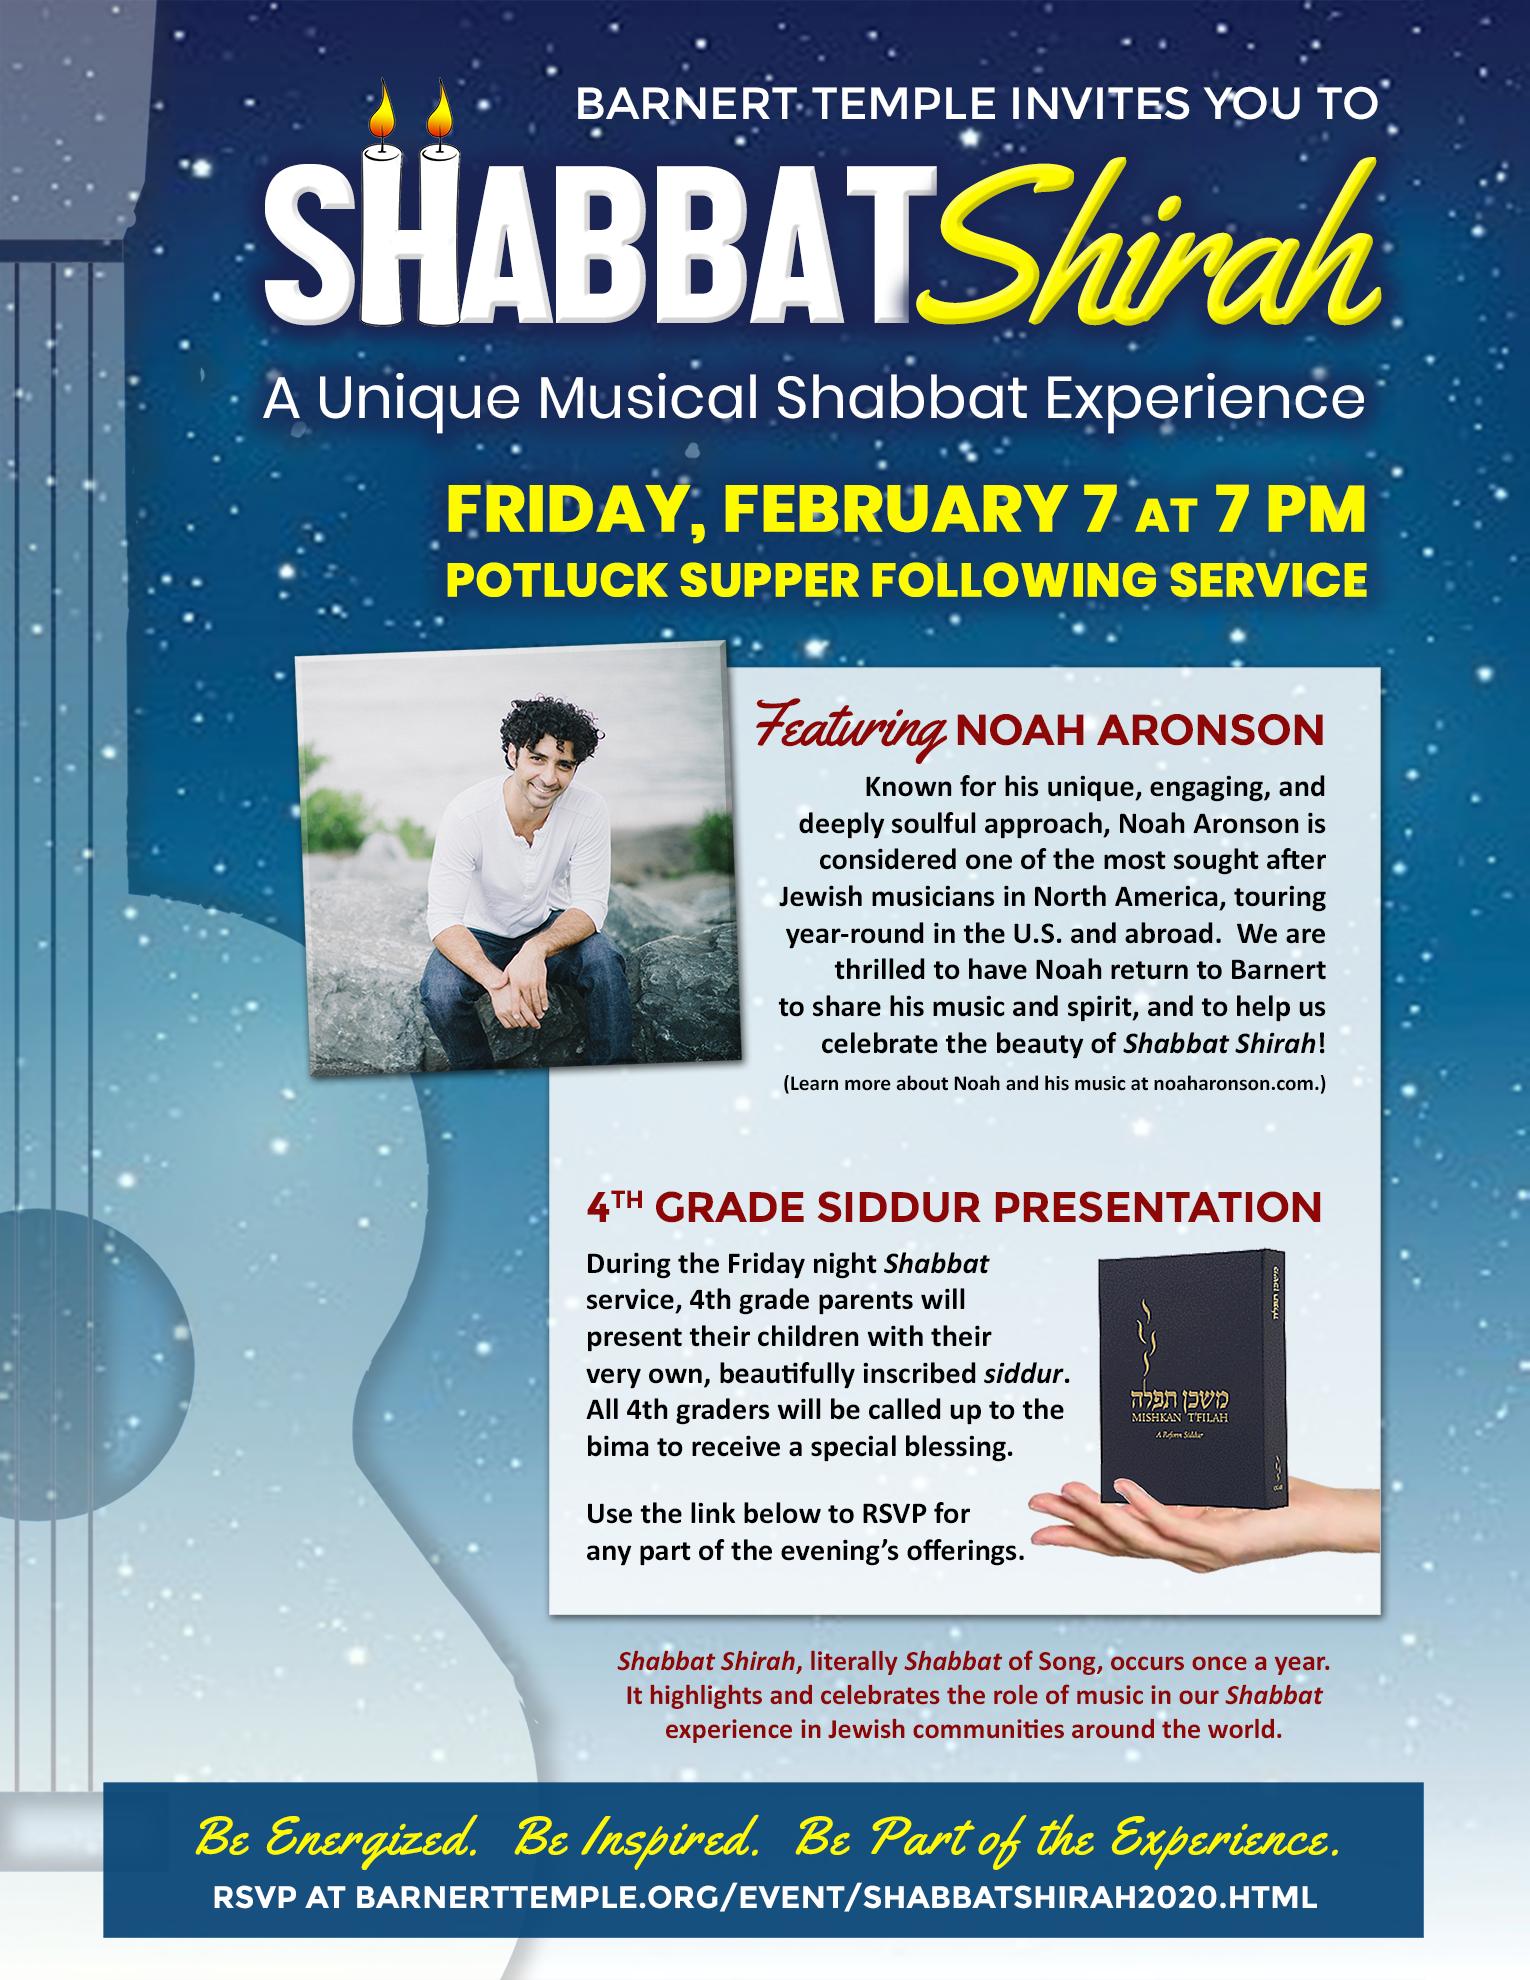 Barnert Temple Shabbat Shirah Celebration February 7, 2020